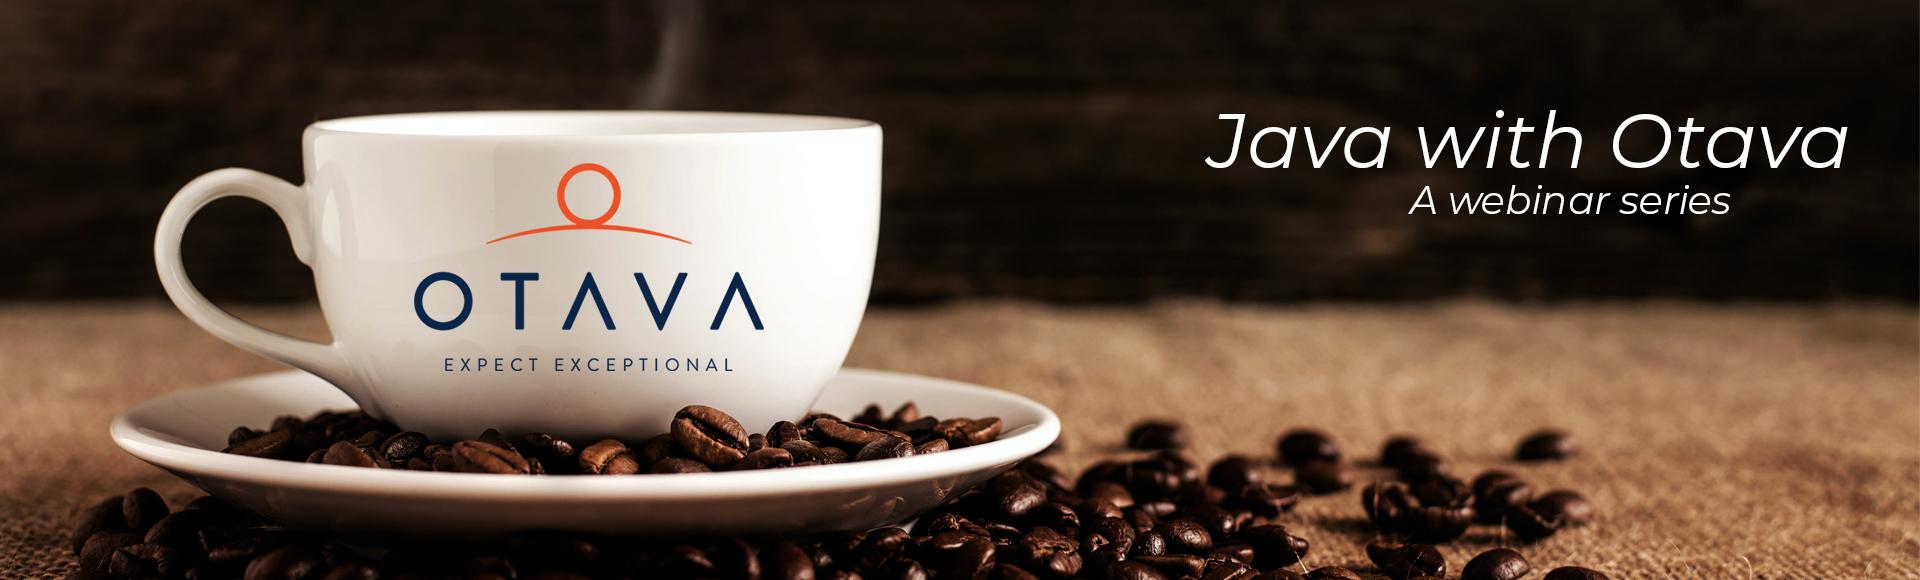 Java with Otava landing page